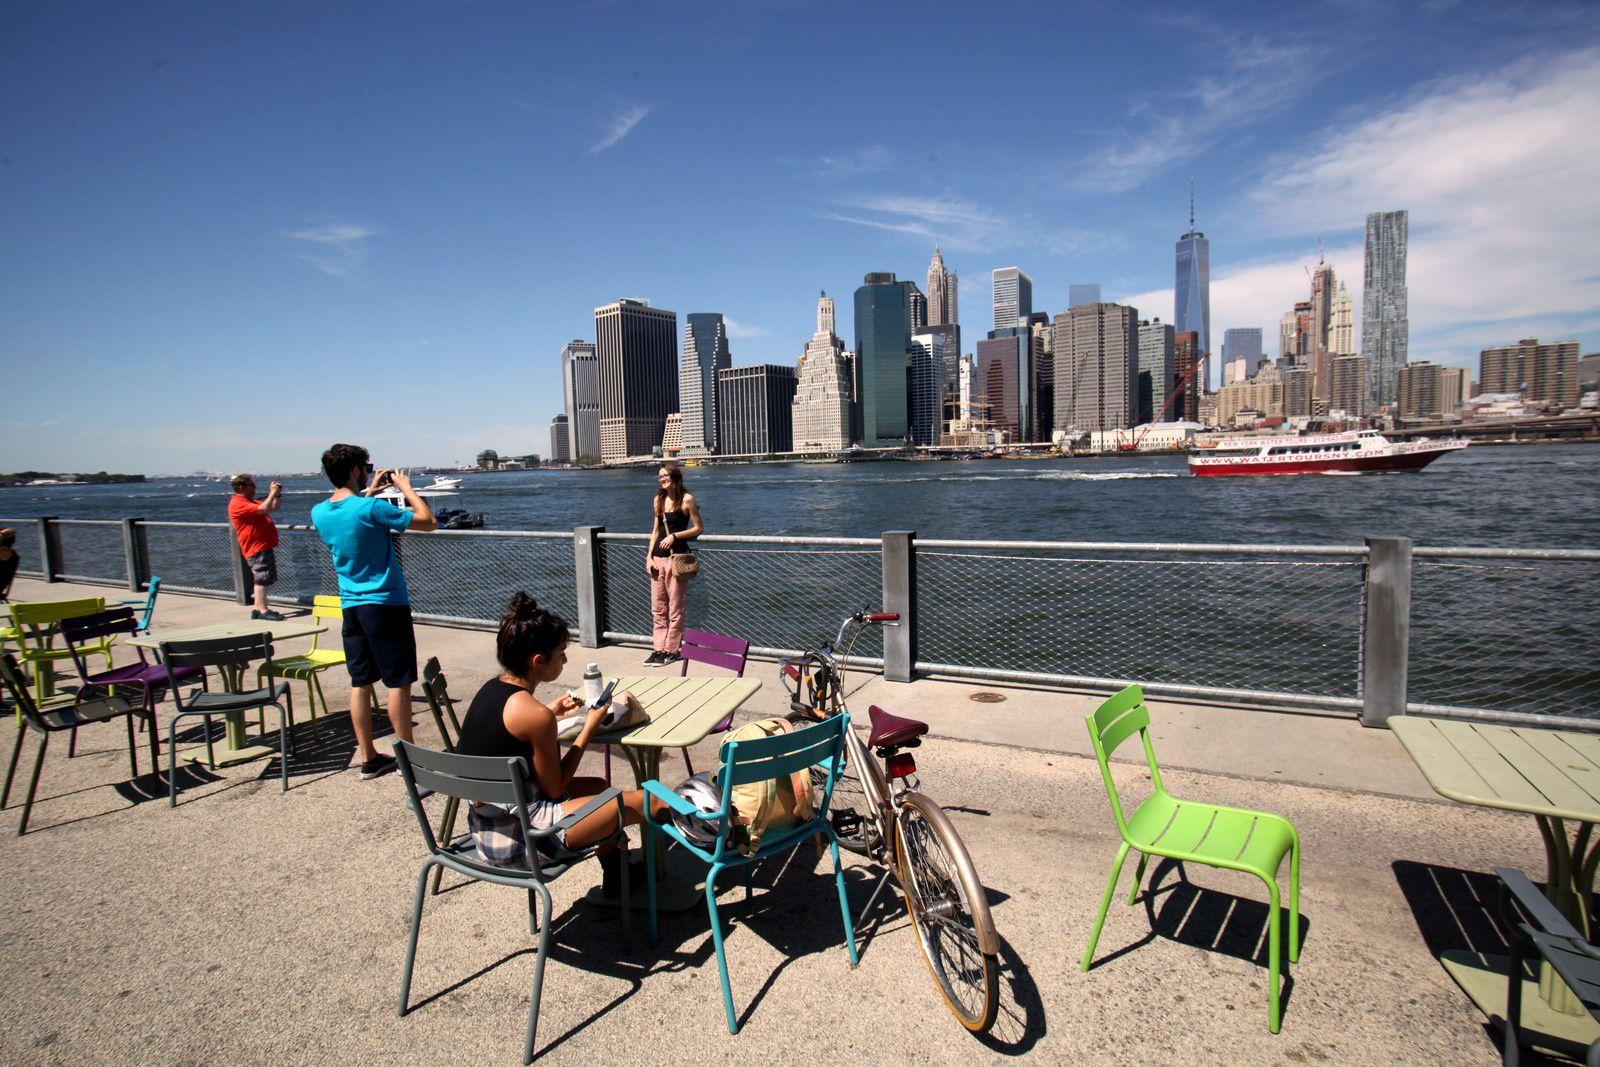 Hypsterical petit tour à Chicago et New York. Brooklyn de Williamsburg à Bushwick